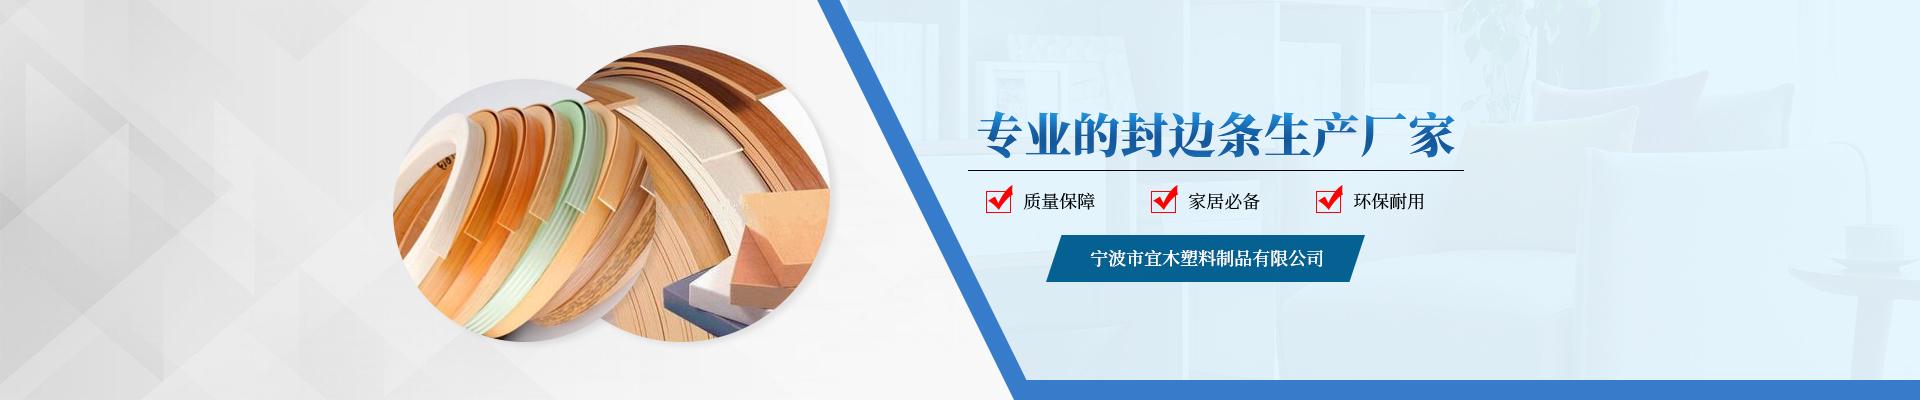 http://www.nbyimu.cn/data/upload/202008/20200803161421_528.jpg